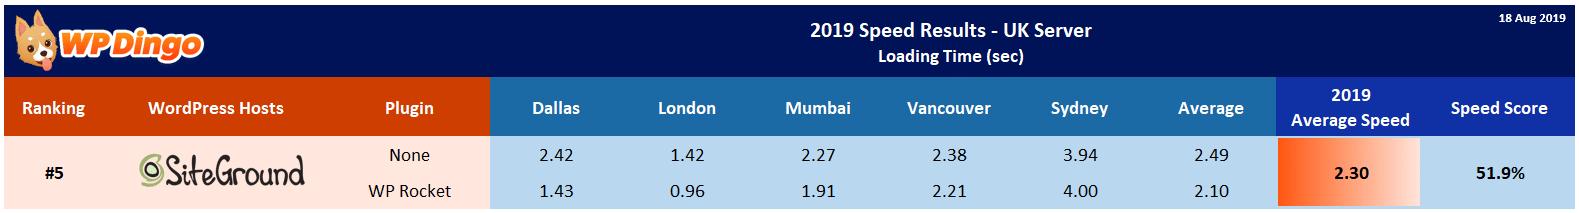 2019 SiteGround Speed Table - UK Server